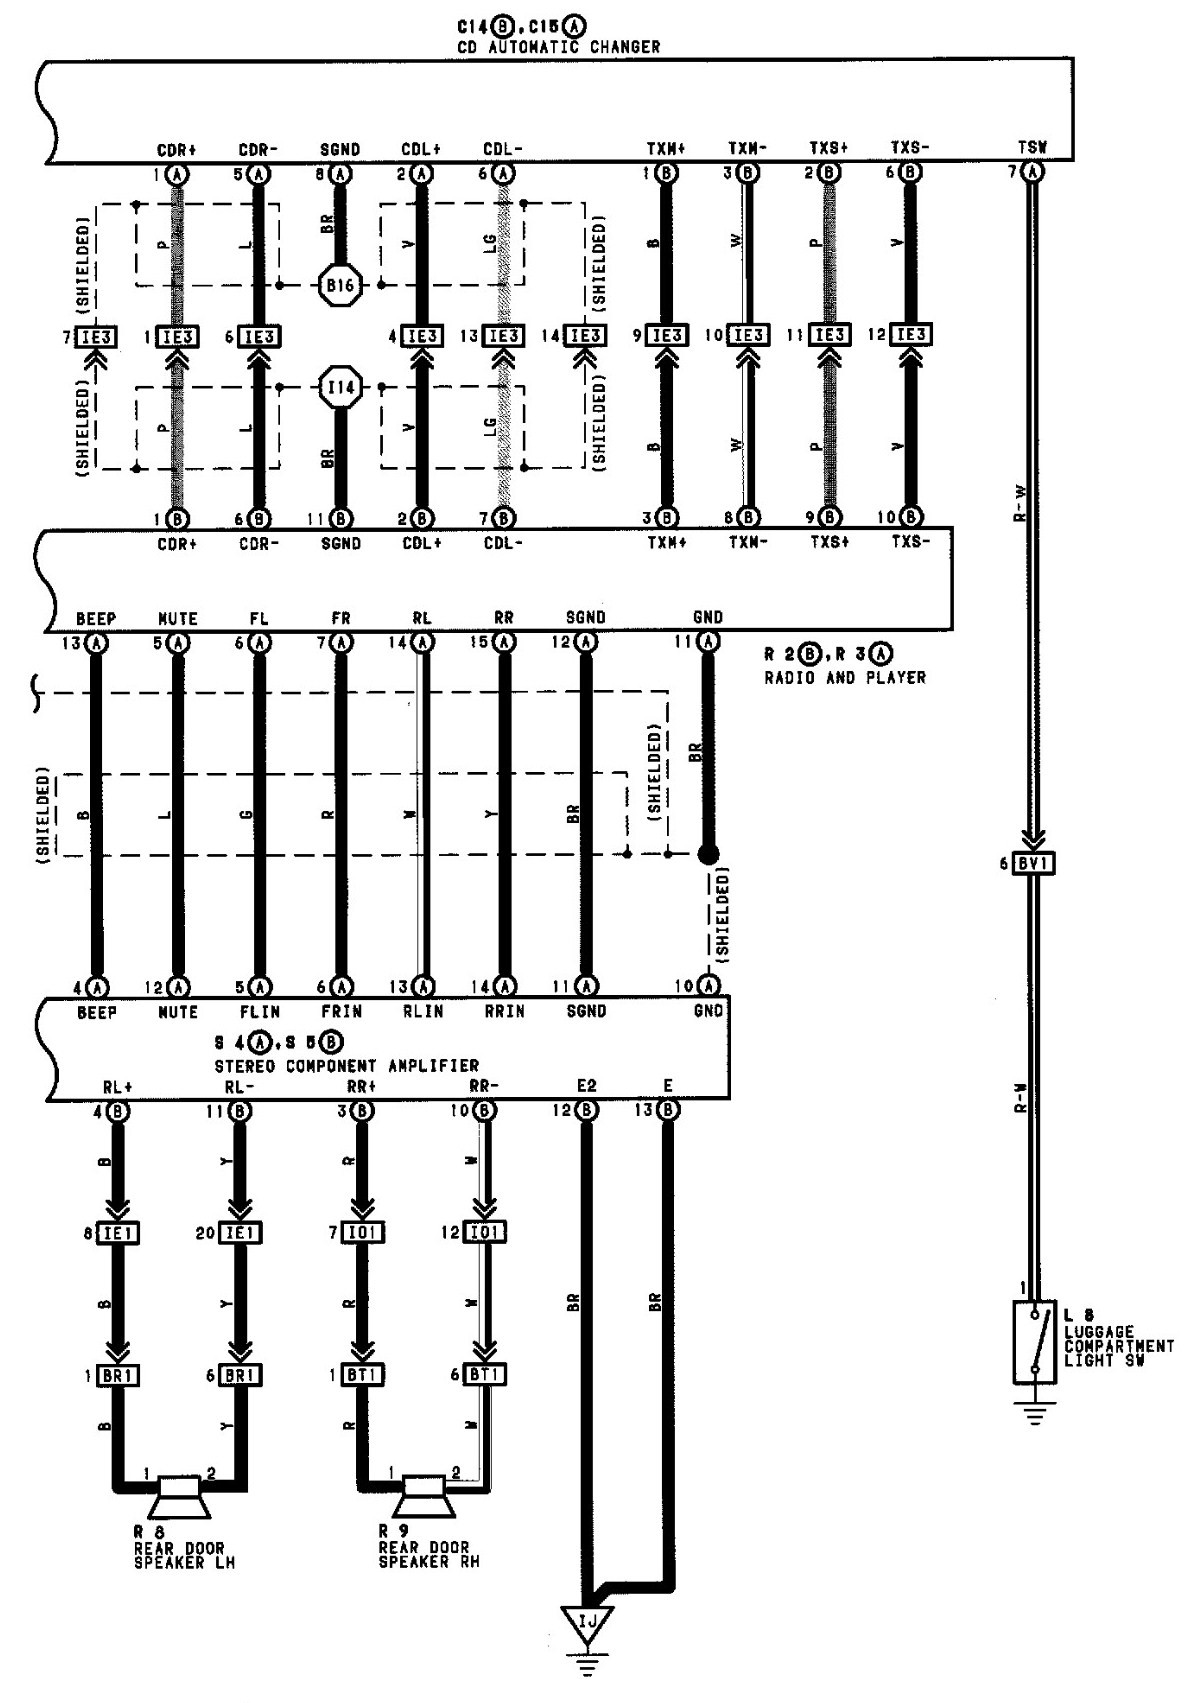 1995 toyota camry wiring diagram